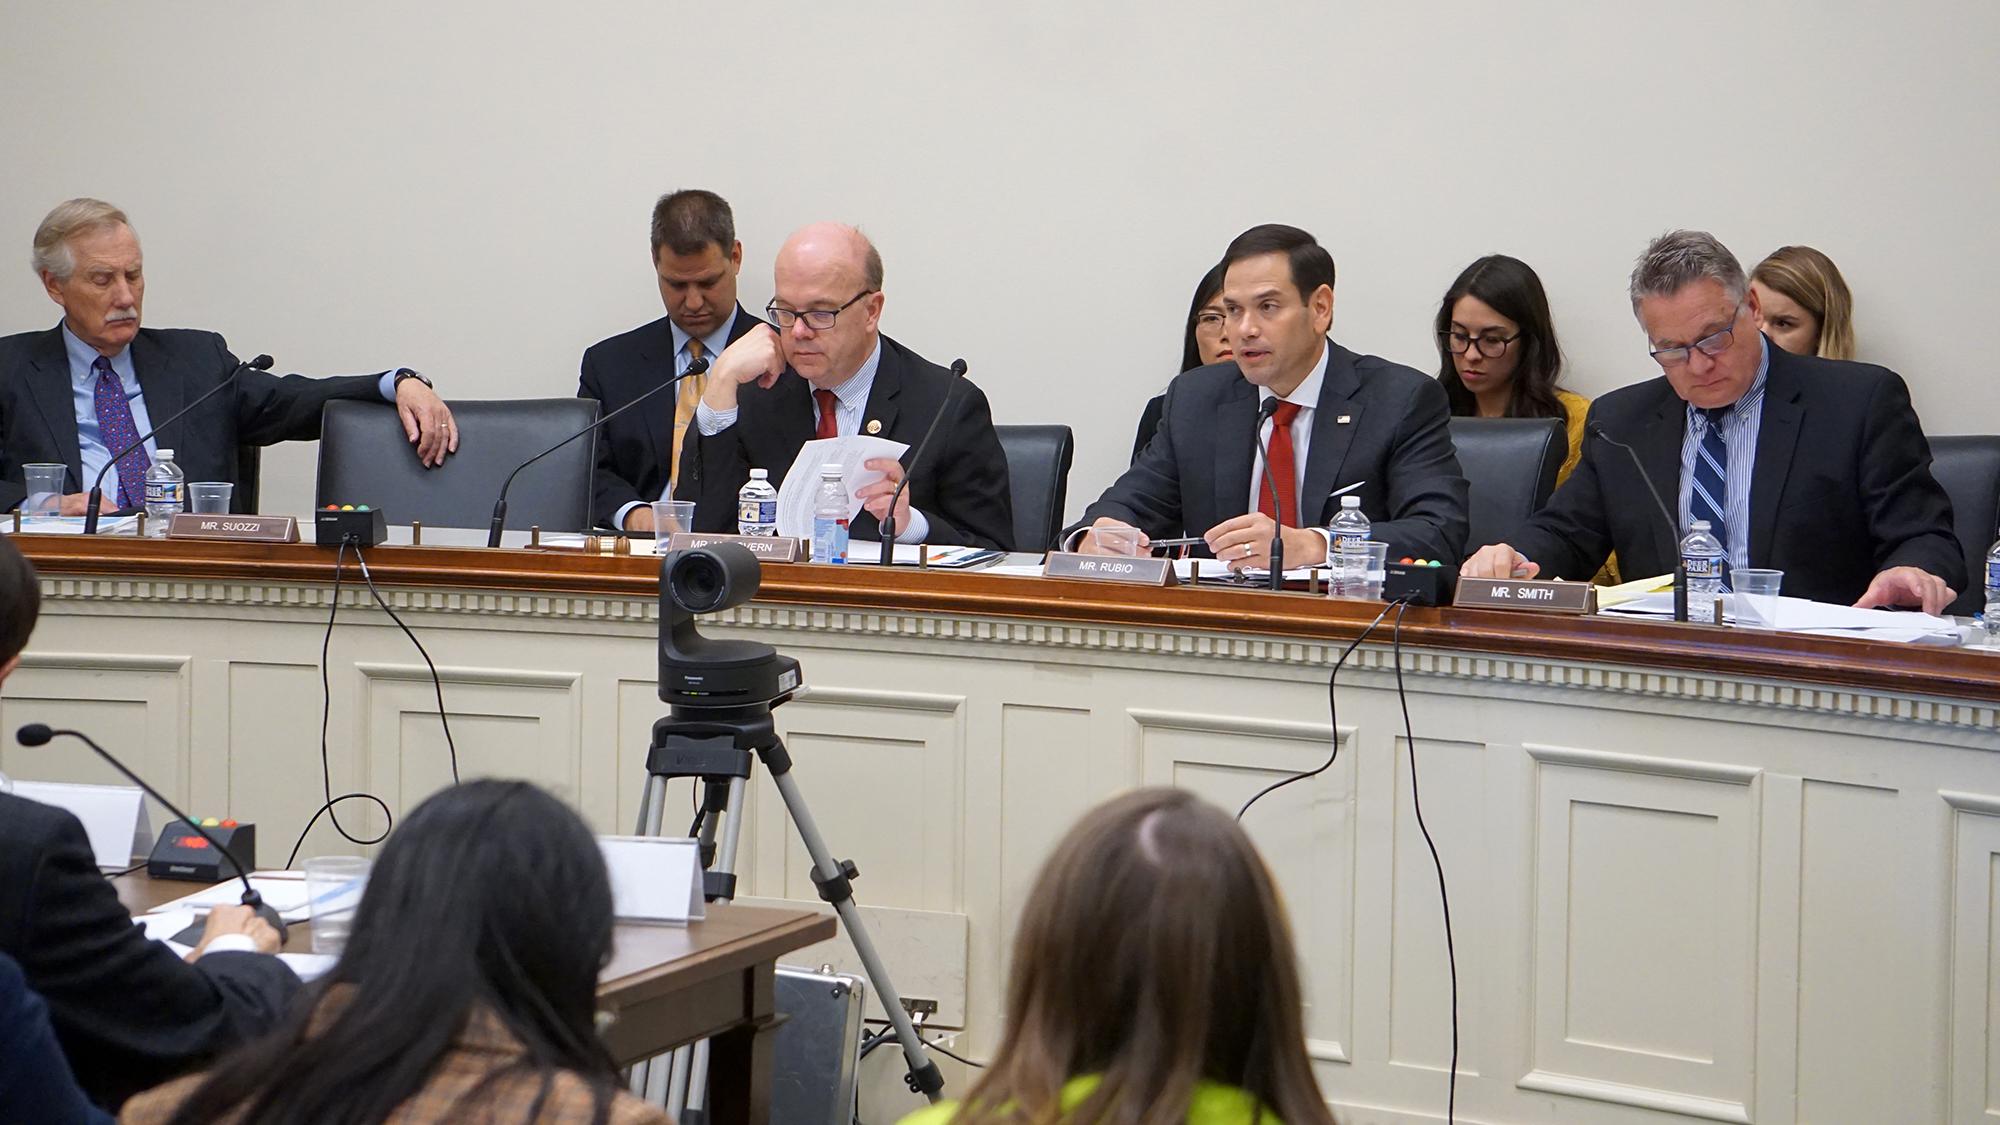 CECC主席、眾議員Jim McGovern(主席台右三),CECC共同主席魯比奧(Marco Rubio )(右二),美國會及行政當局中國委員議員 Chris Smith(右一)。(方明/大紀元)